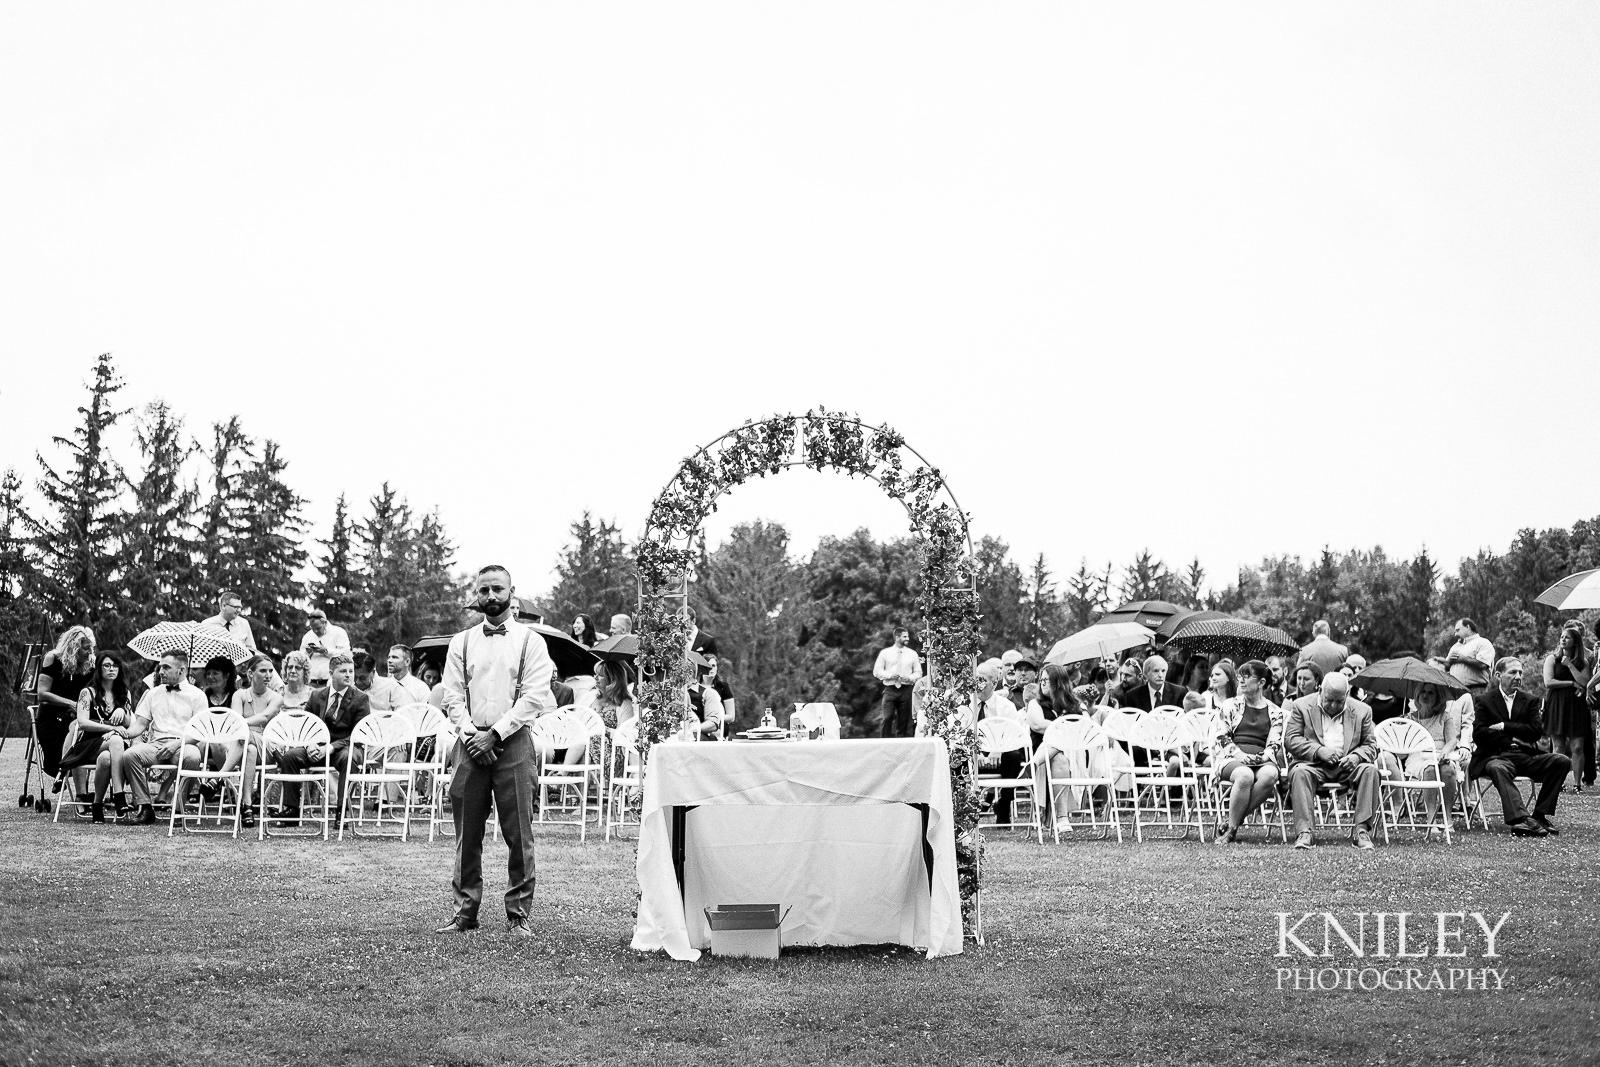 035 - Ontario Golf Club Wedding Pictures - XT2B8120.jpg